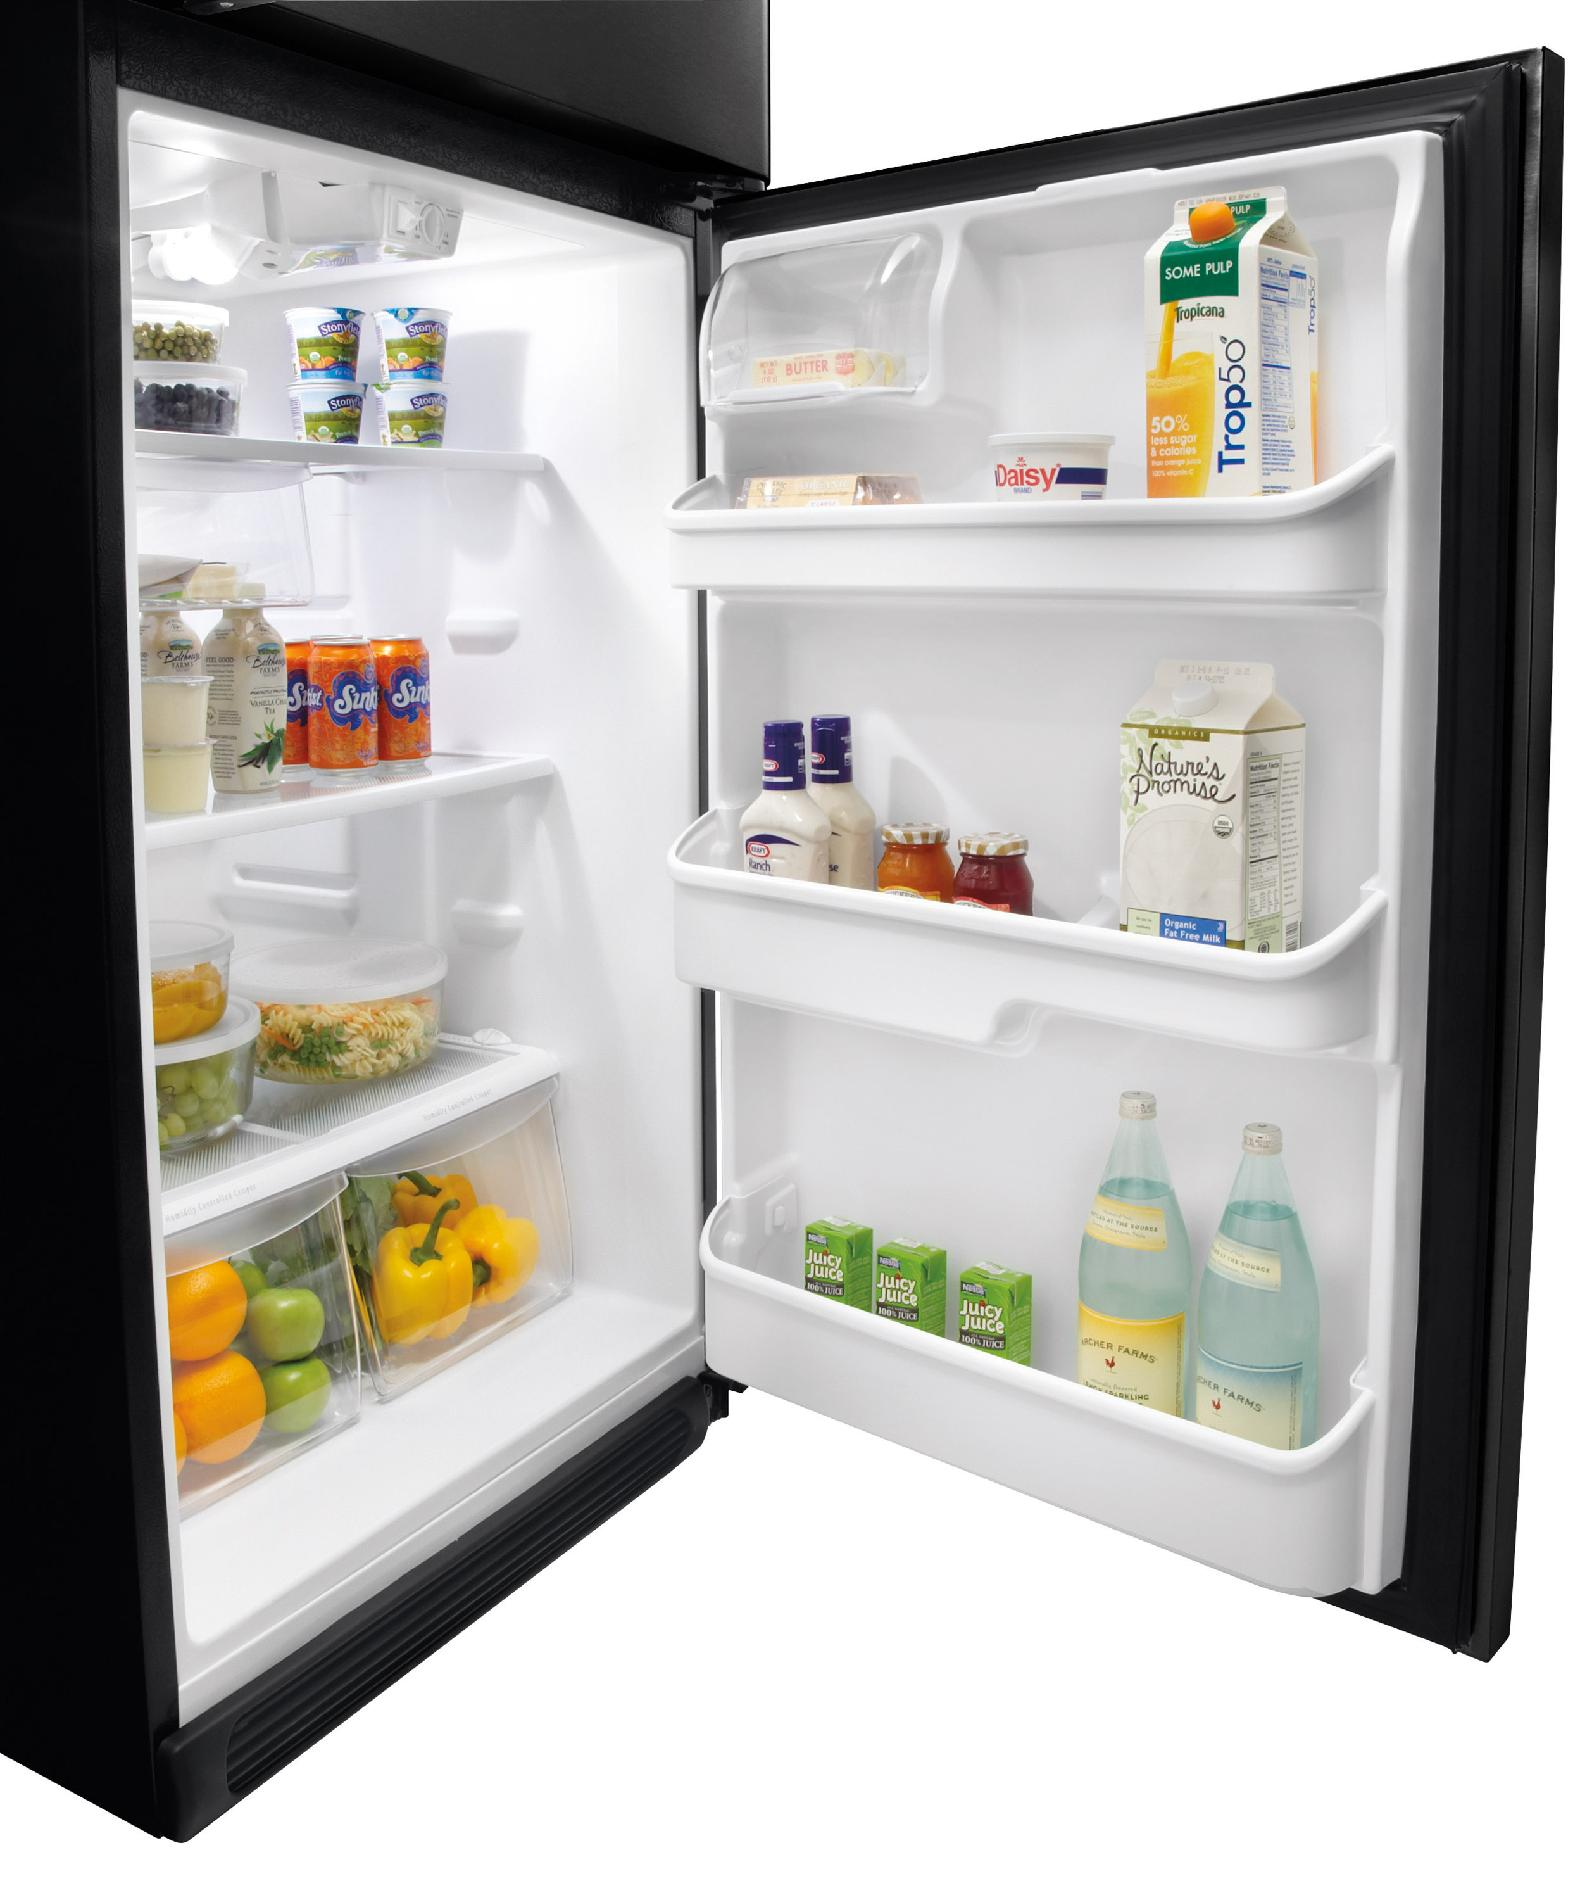 Frigidaire 18.2 cu. ft. Top-Freezer Refrigerator - Black